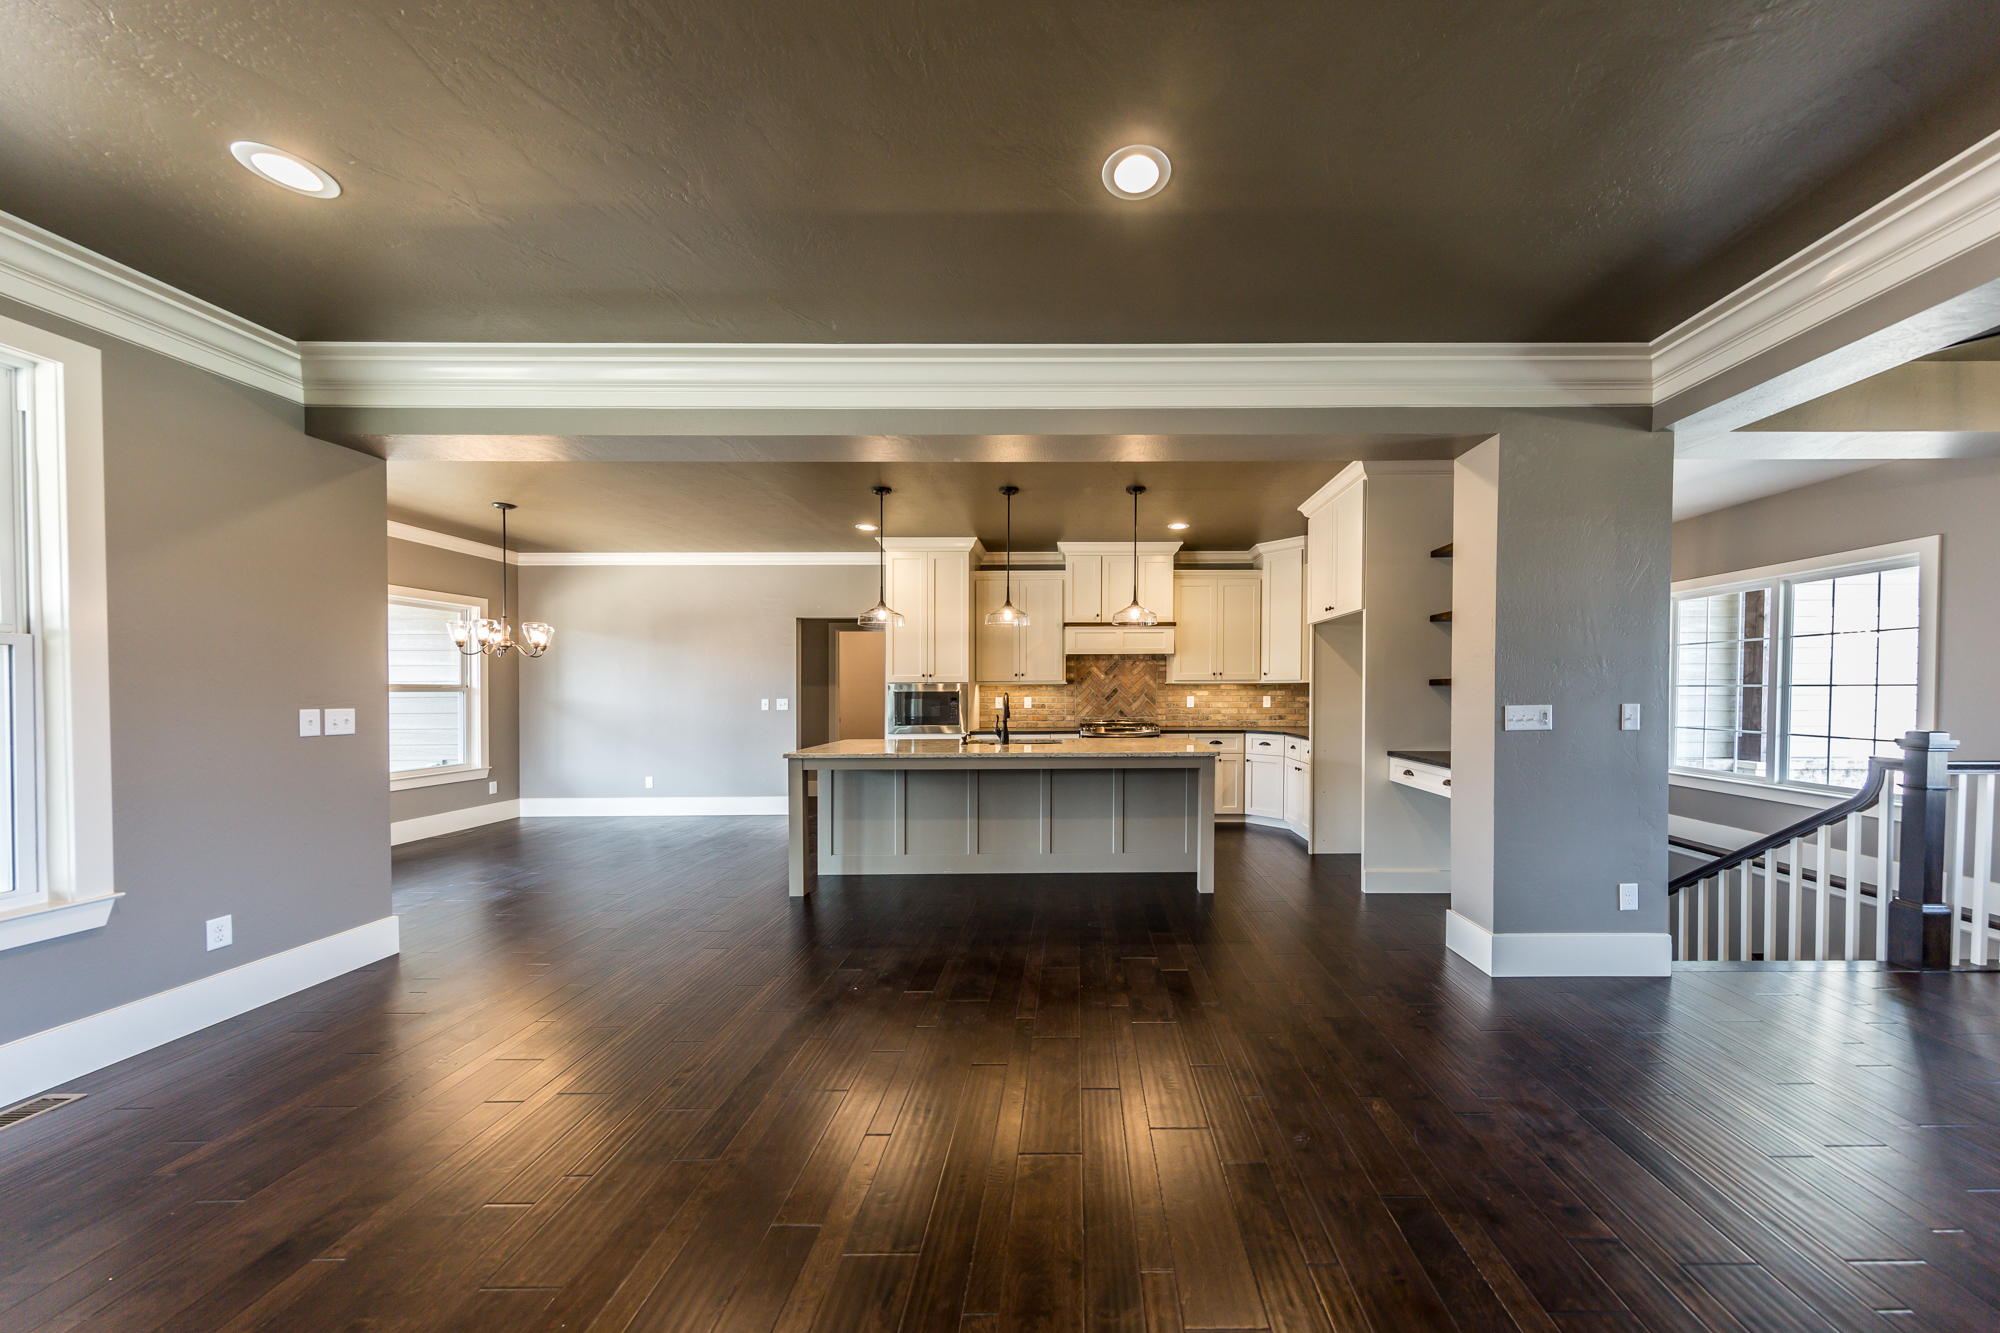 New-Construction-For-Sale-Bethel-Ridge-Farms-Scott-AFB-Illinois-7.0.jpg